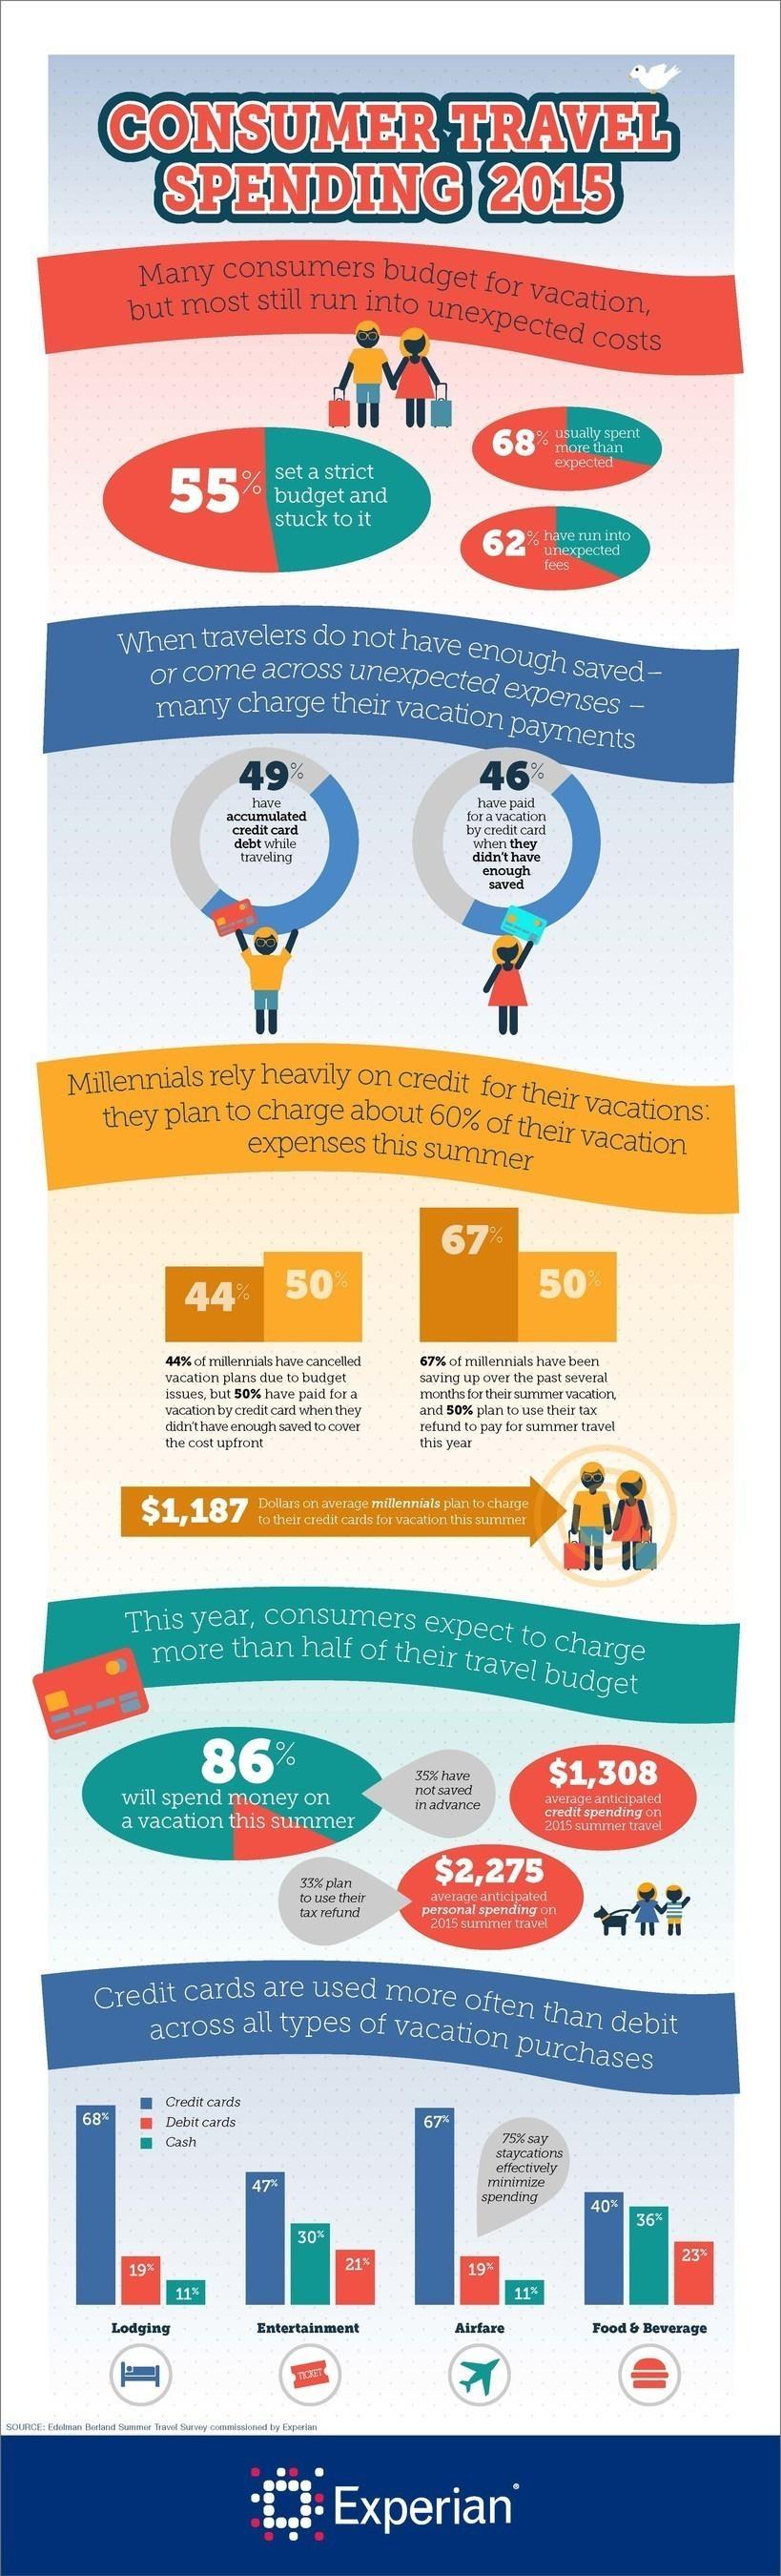 Experian Summer Travel Survey Results